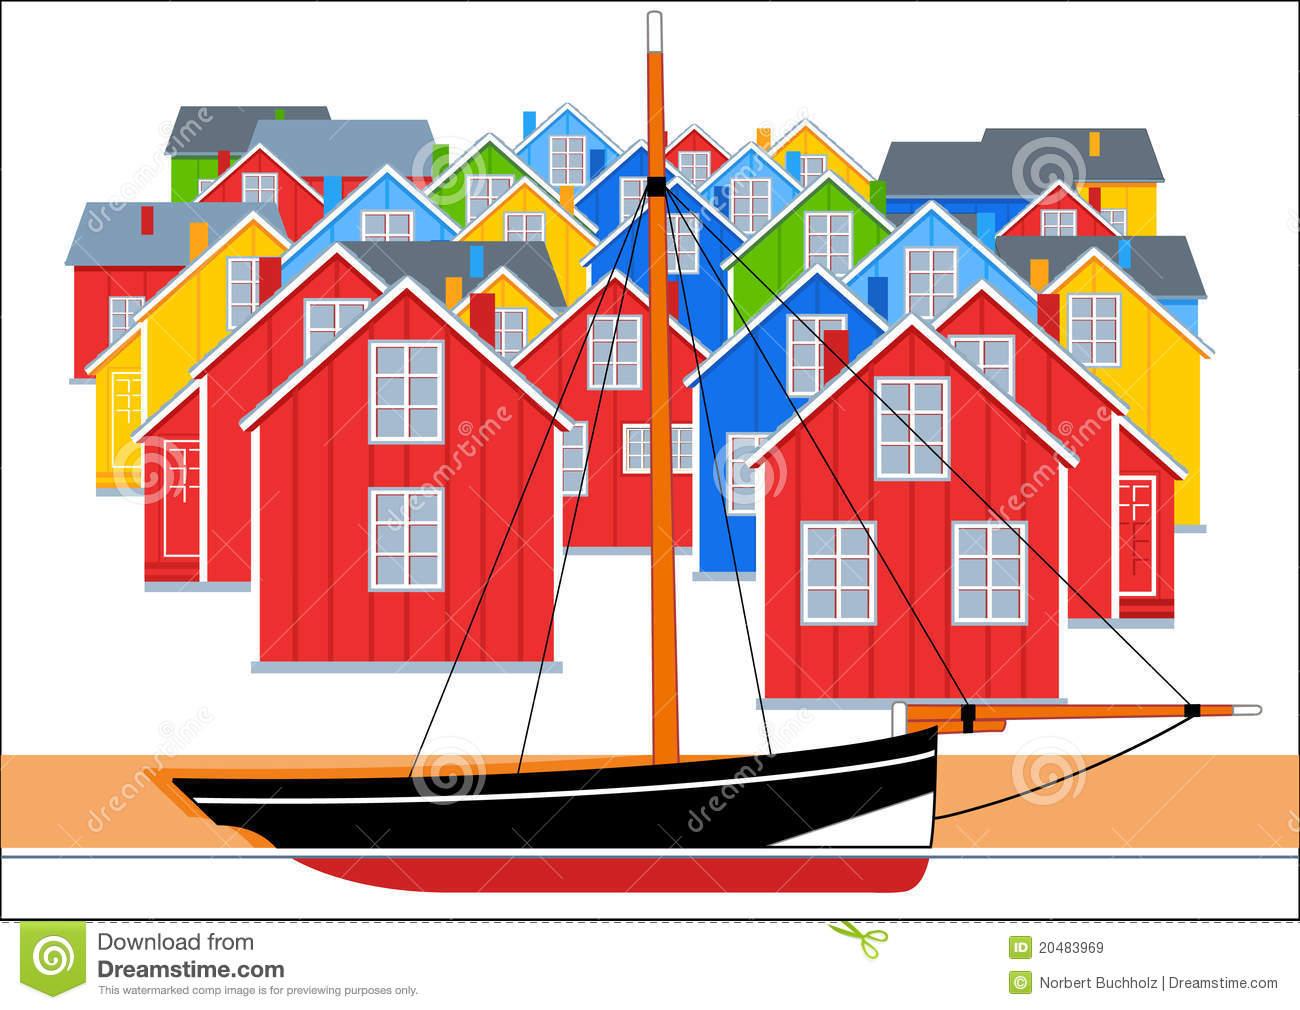 Fishing Village Illustration Royalty Free Stock Images.